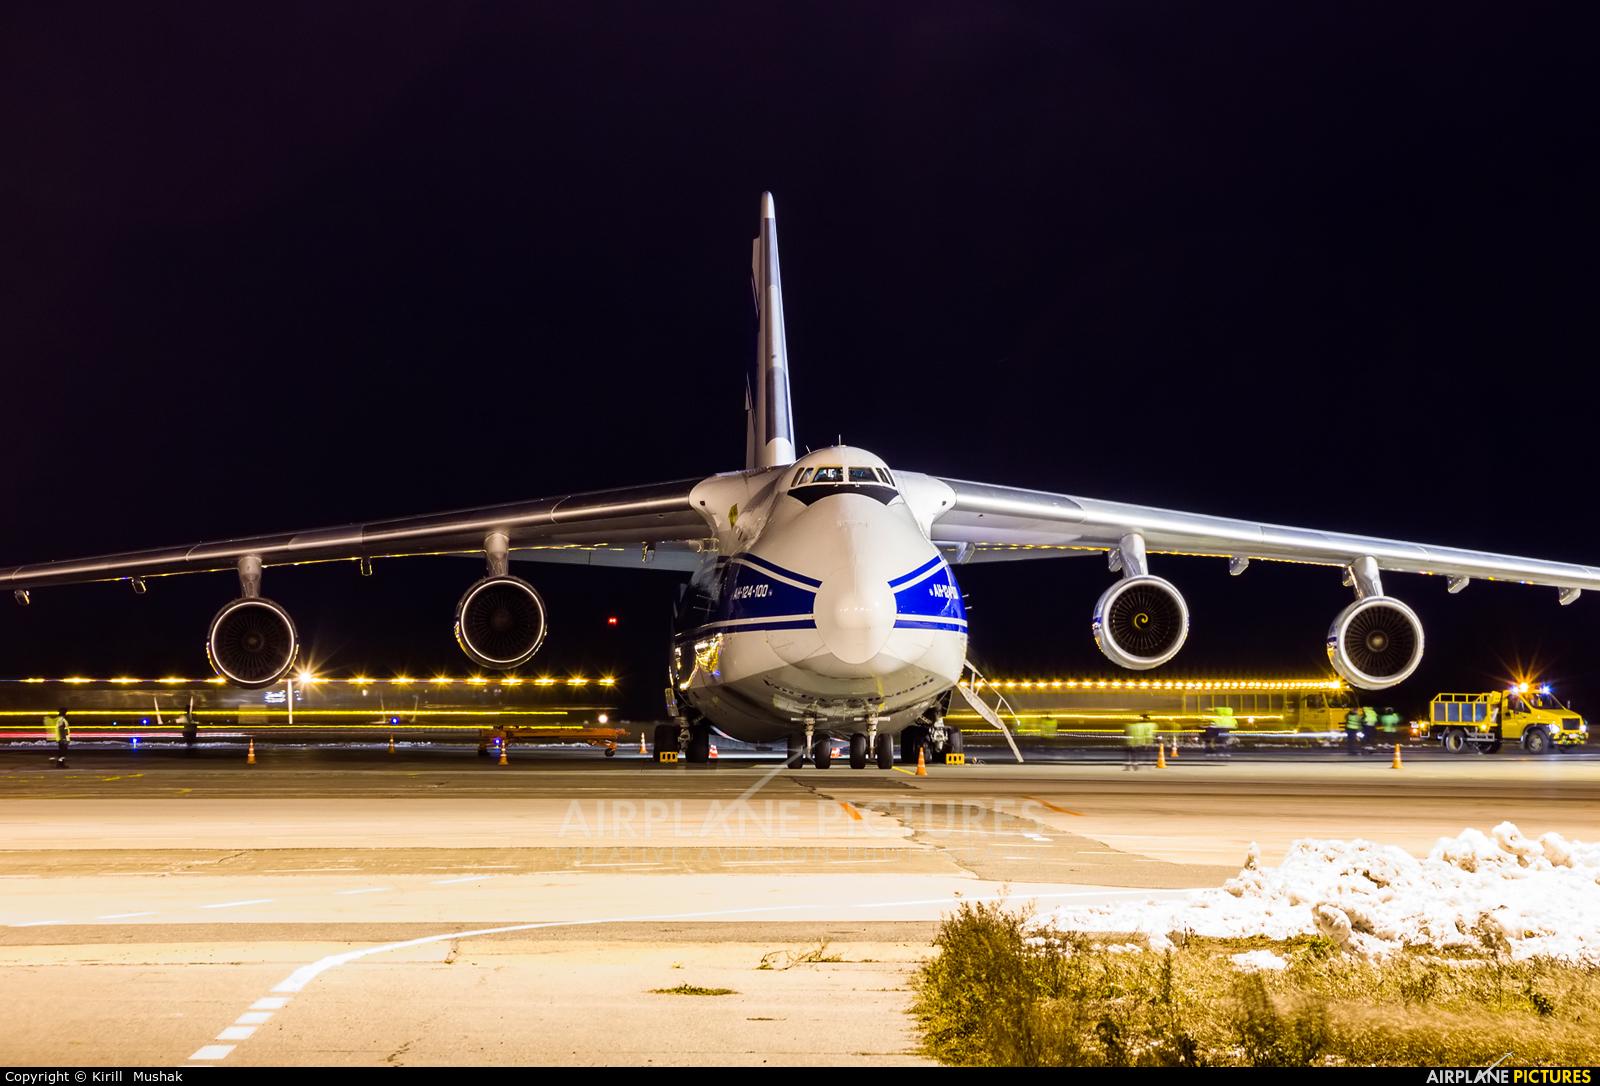 Volga Dnepr Airlines RA-82068 aircraft at Bolshoe Savino - Perm